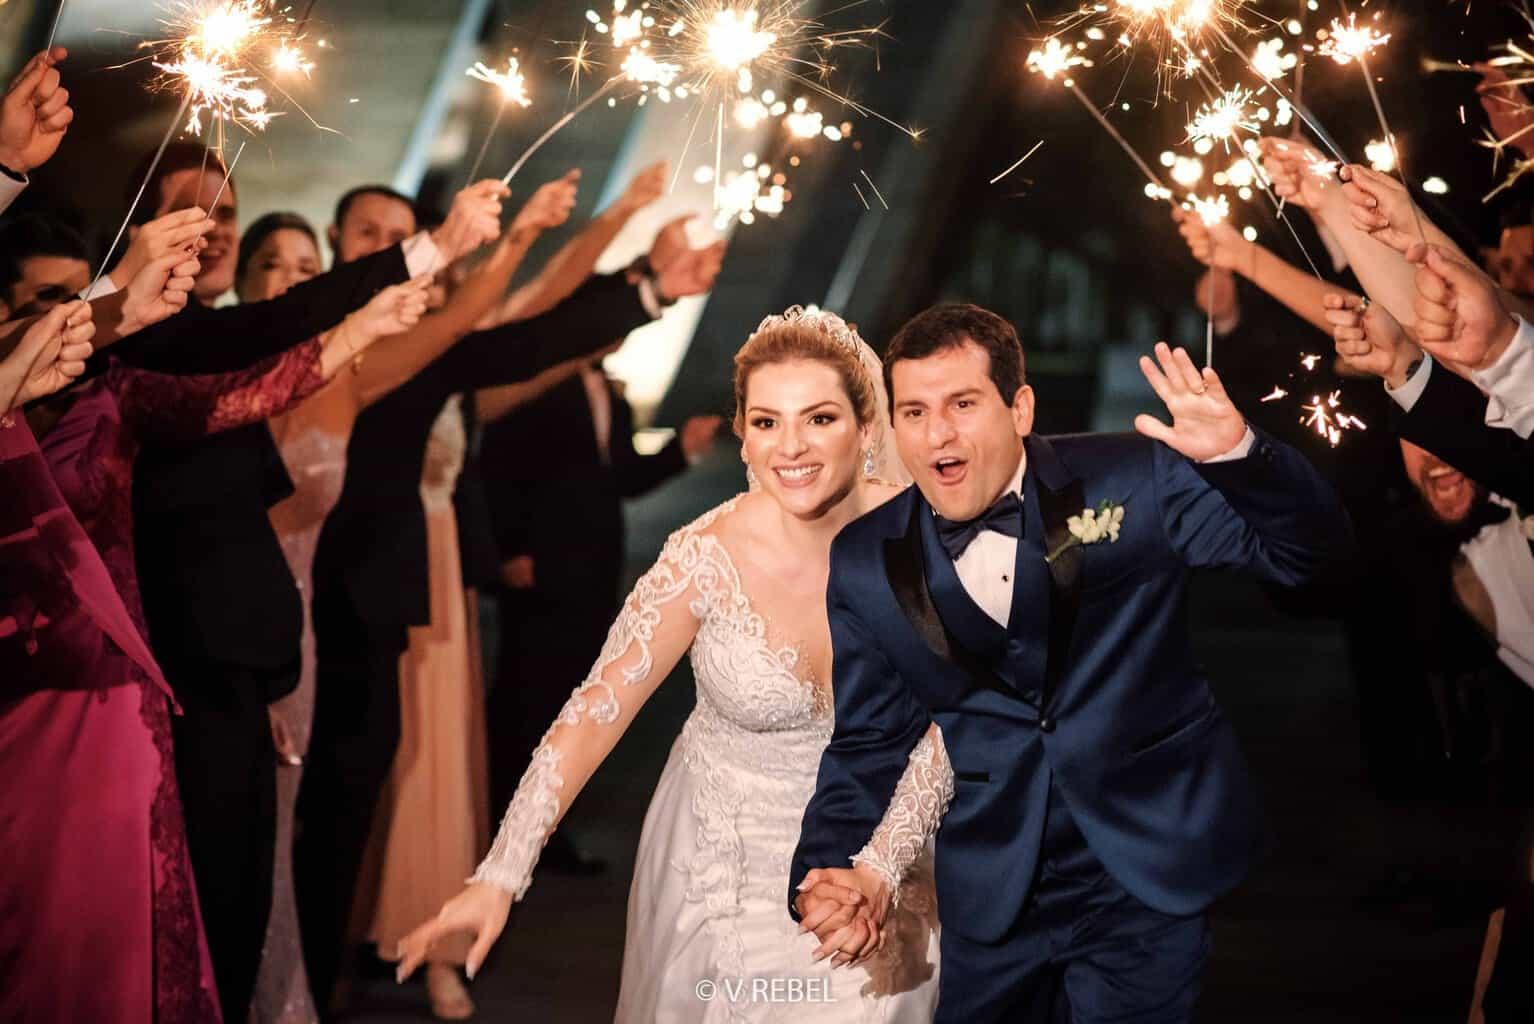 casamento-Caroline-e-Breno-casamento-clássico-entrada-dos-noivos-foto-do-casal-fotografia-VRebel80